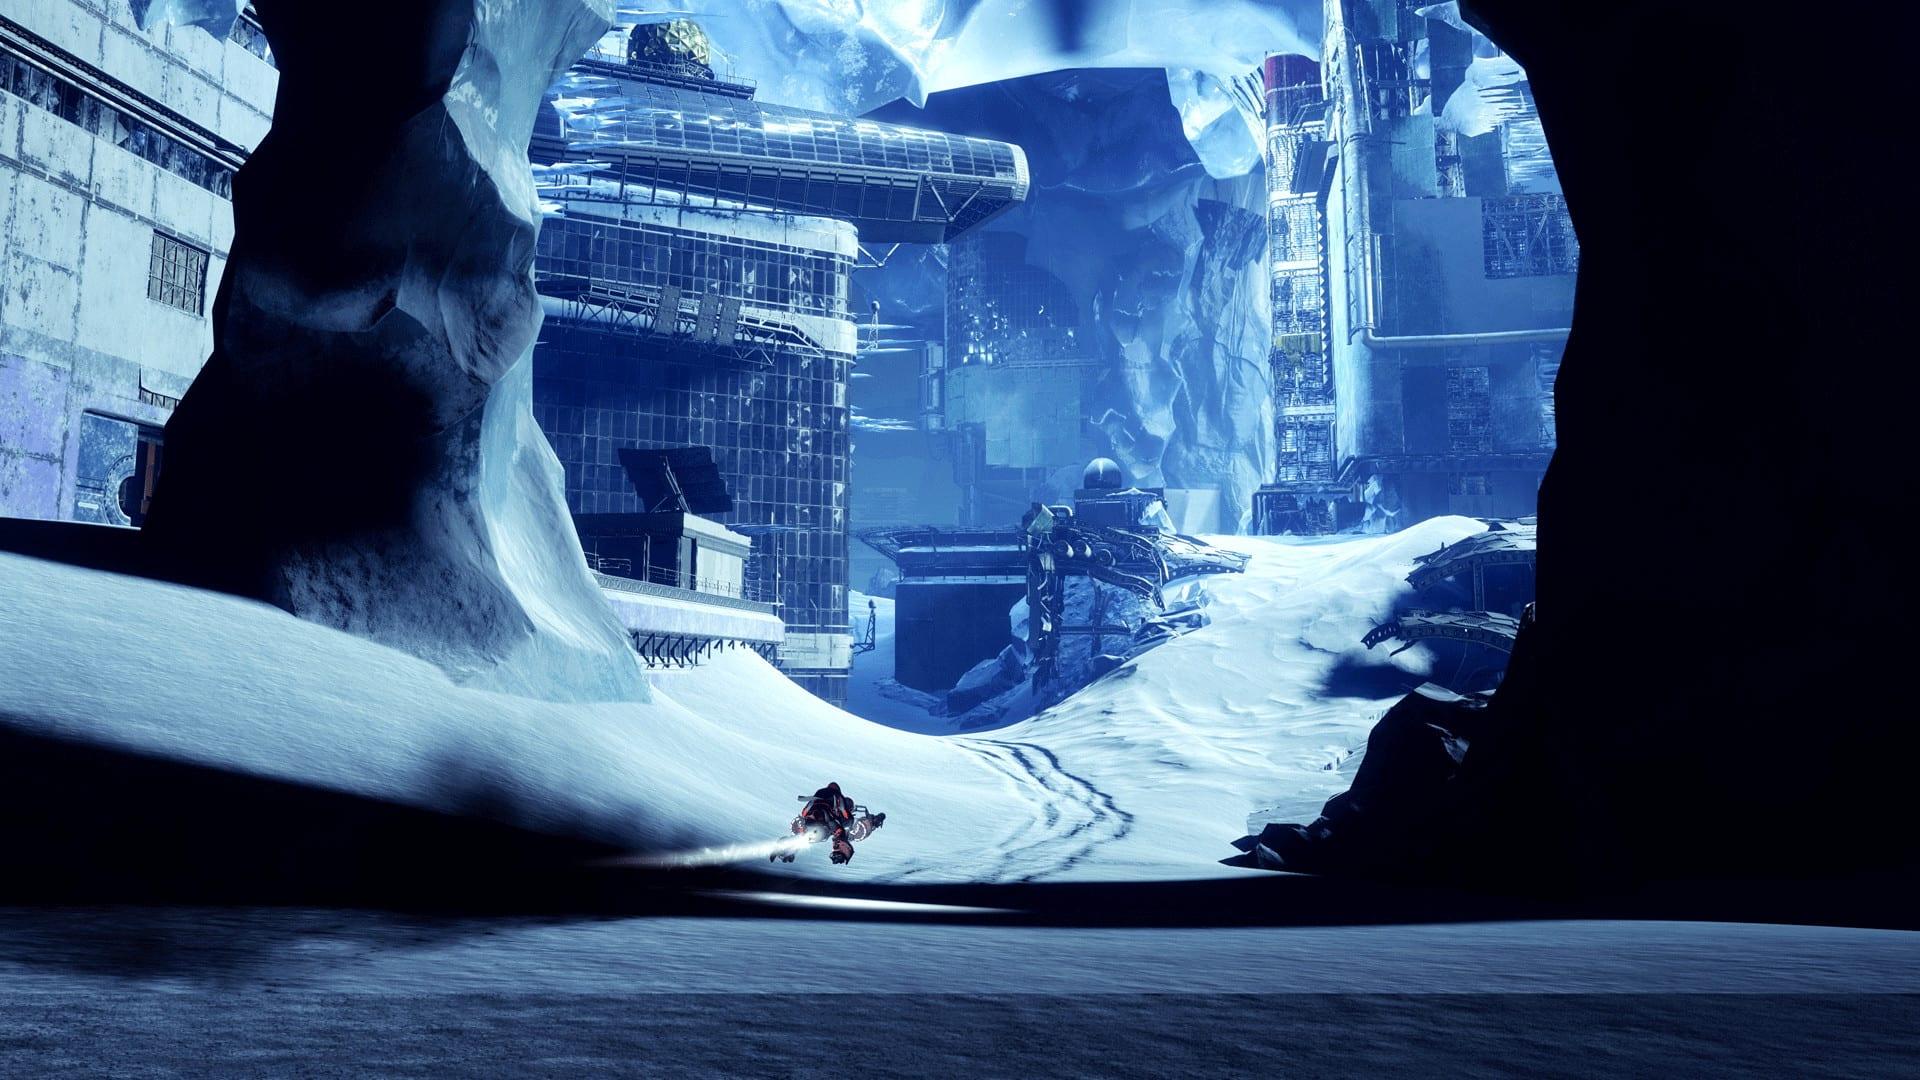 Destiny 2 Beyond Light, Download & Install Size